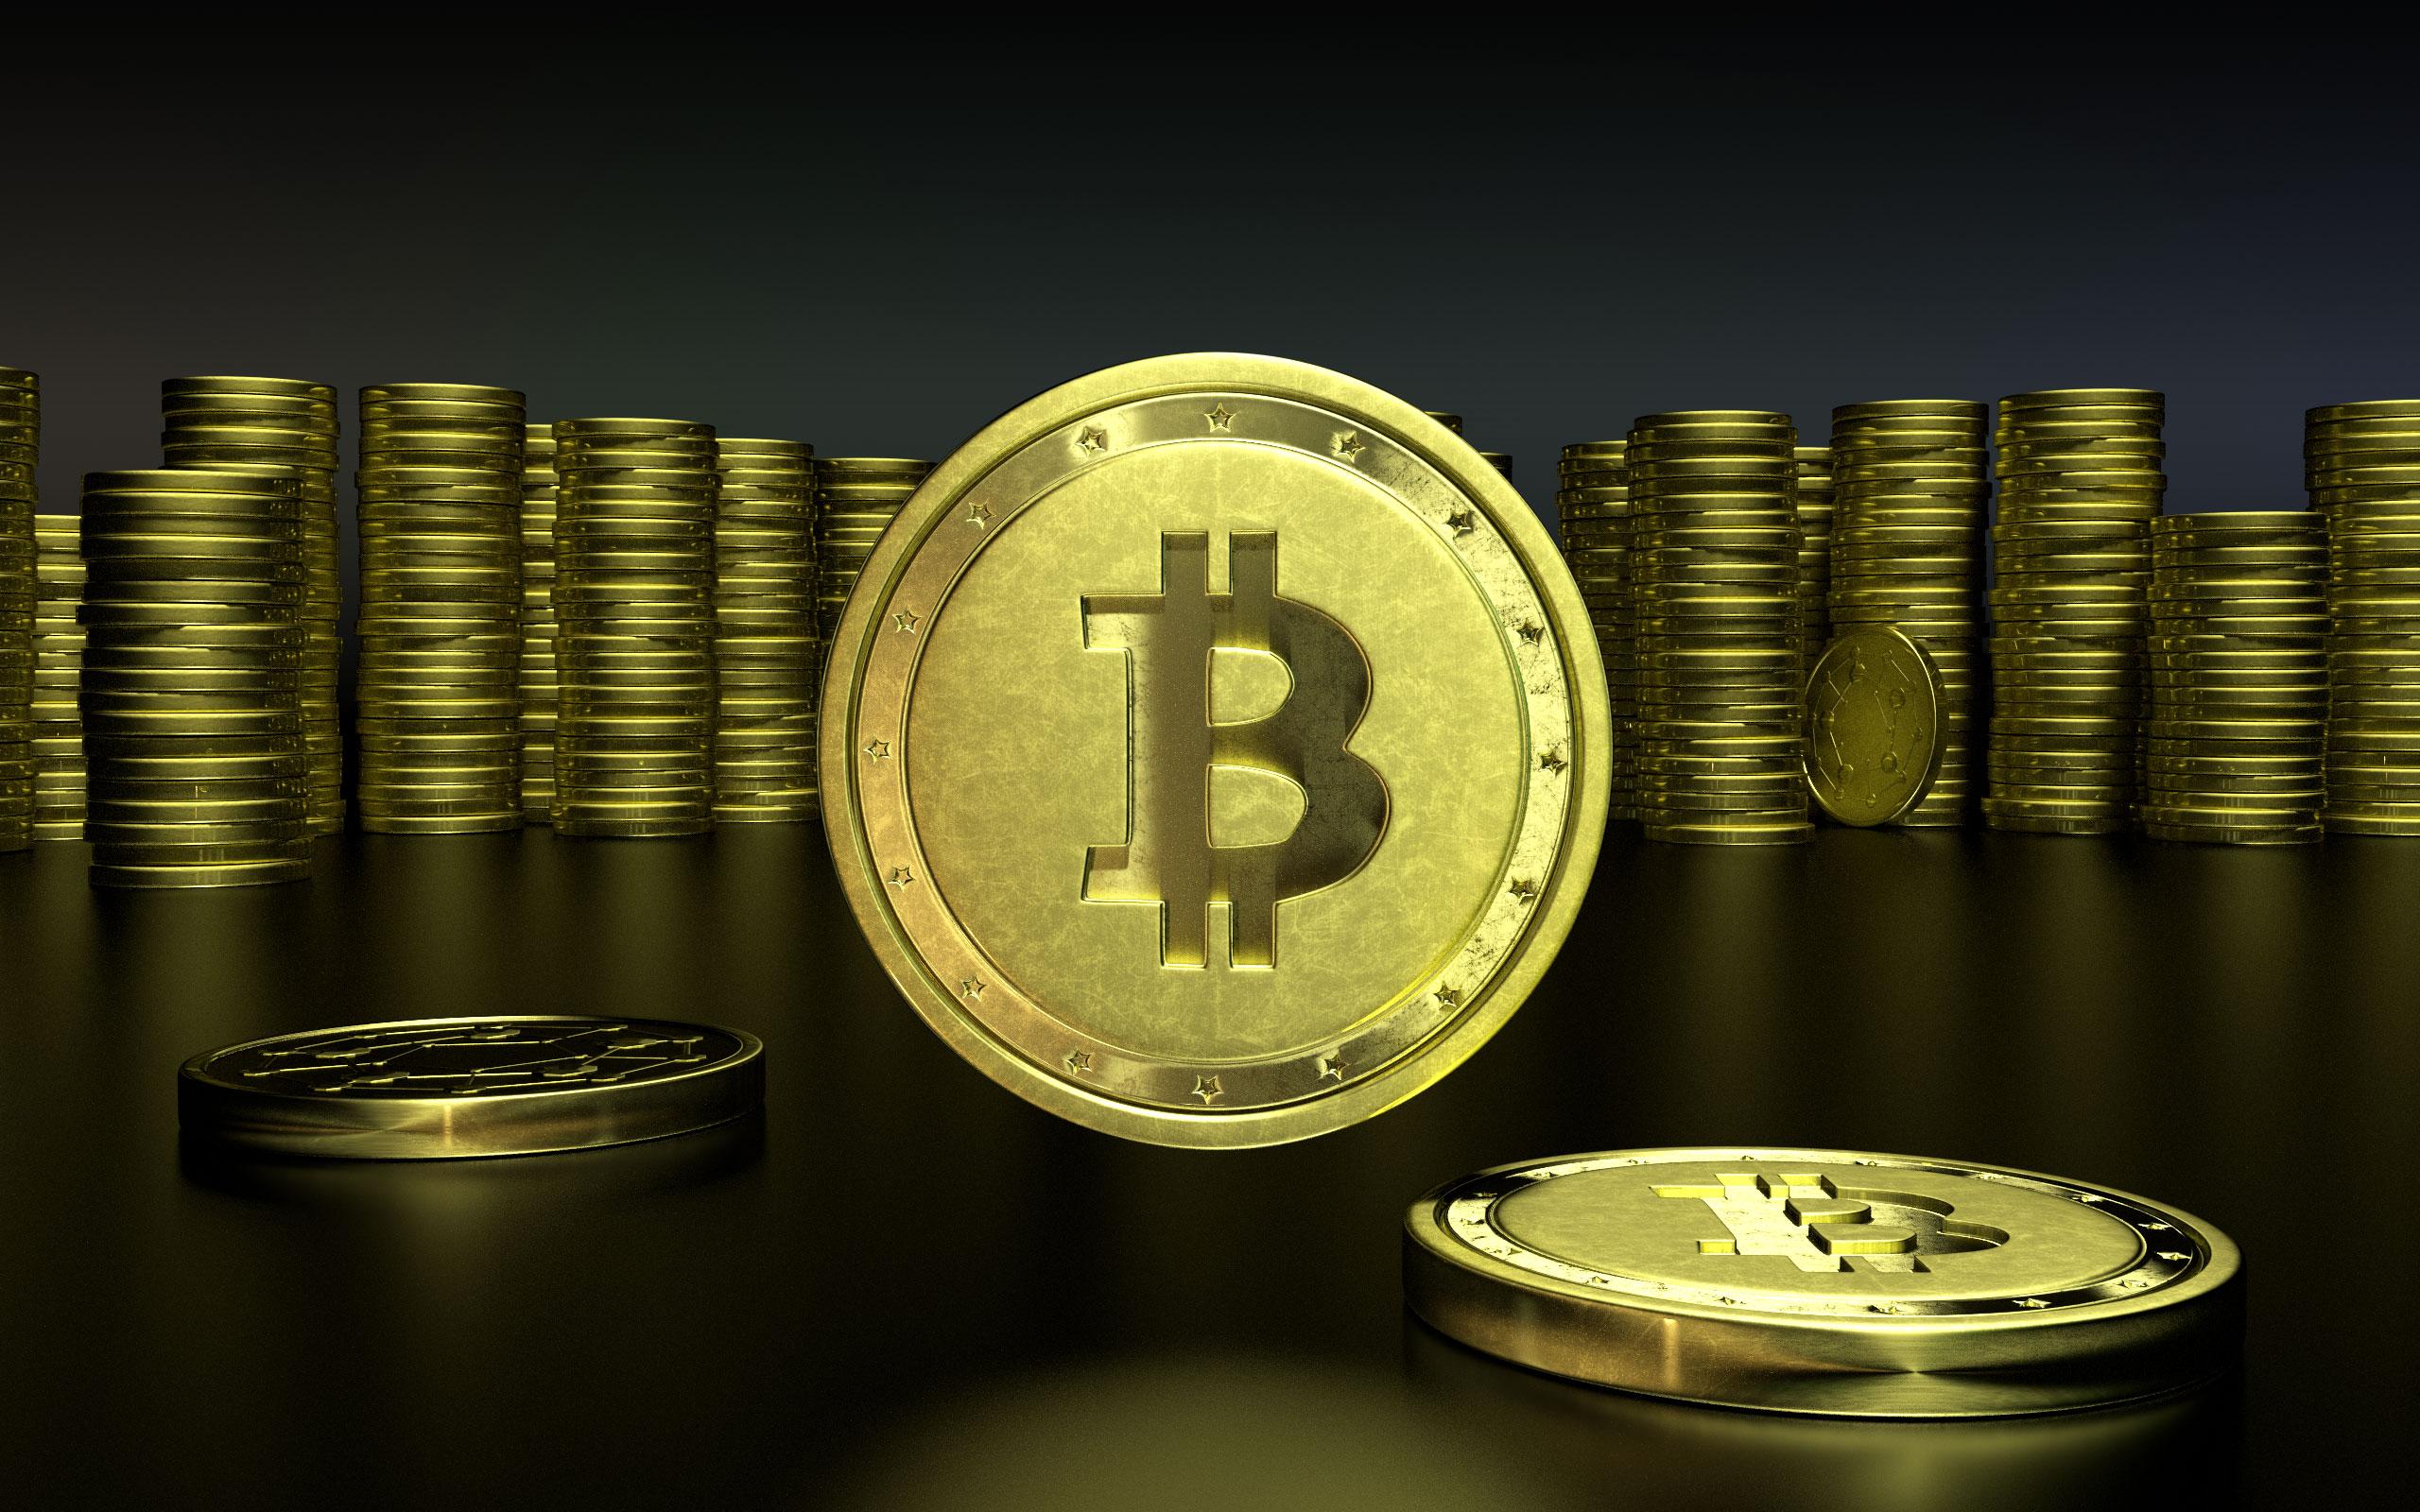 Картинки про криптовалюта 2048 на 1152 квик программа для торговли на бирже